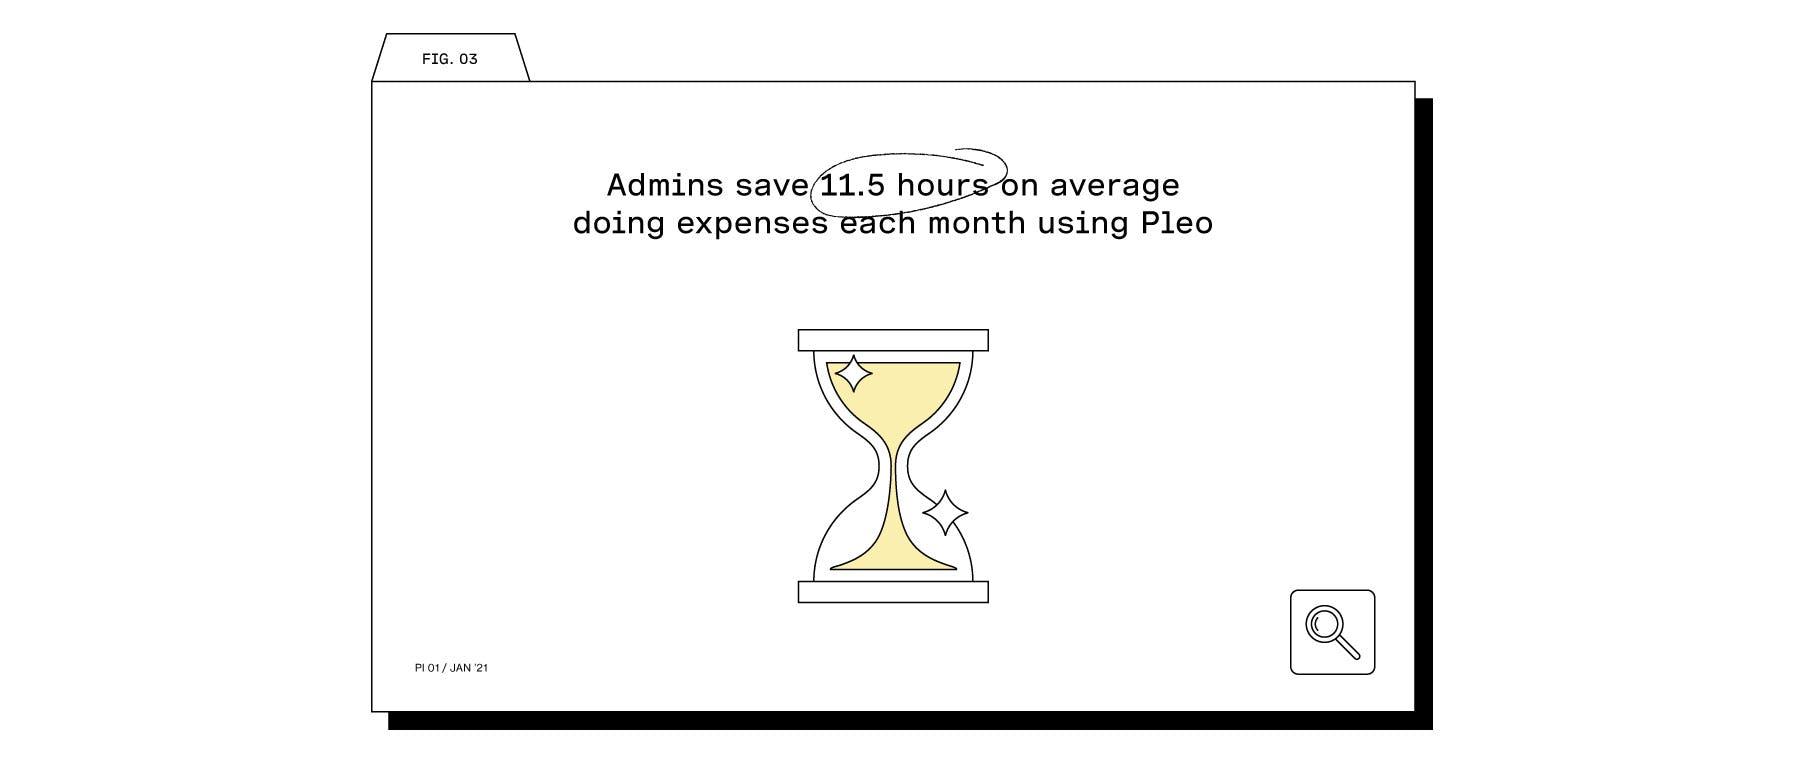 Save 11.5 hours using Pleo